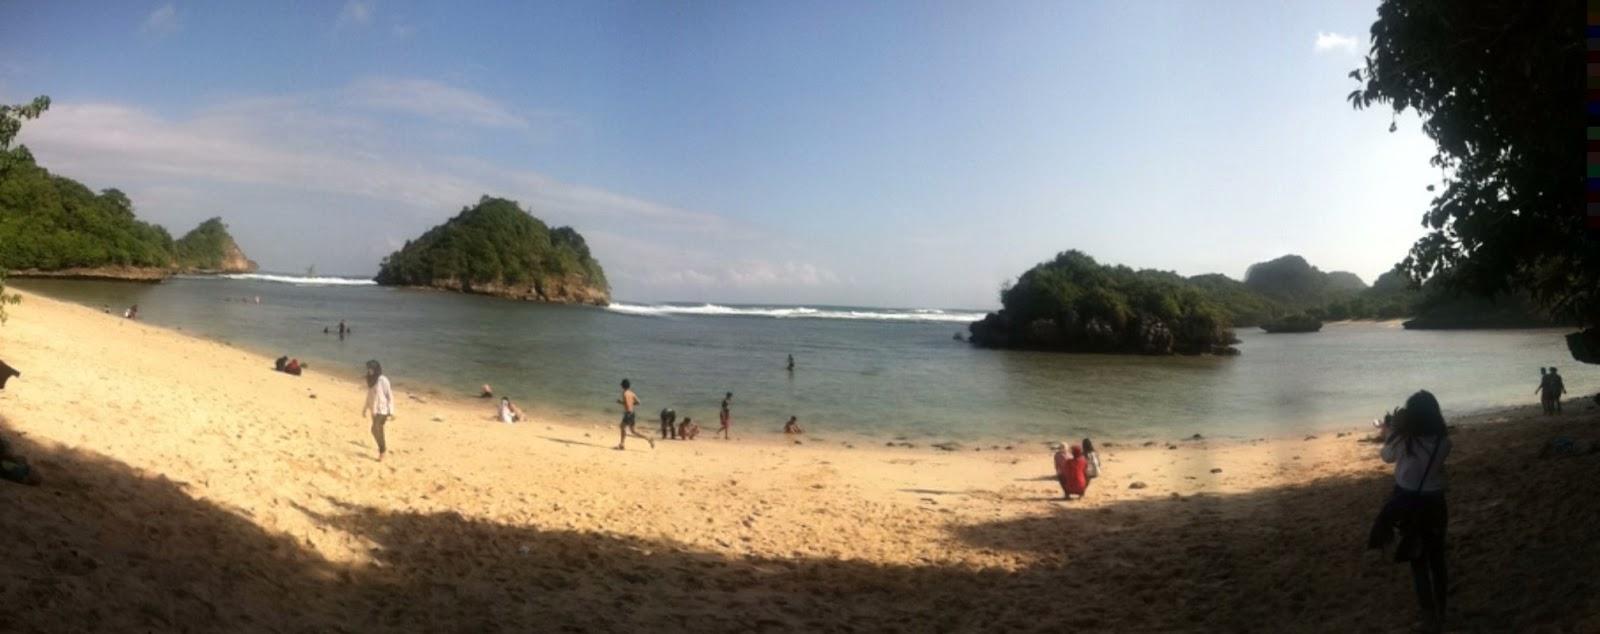 Journey Pantai Clungup Malang Langsung Ya Simak Baik Hehe Terletak